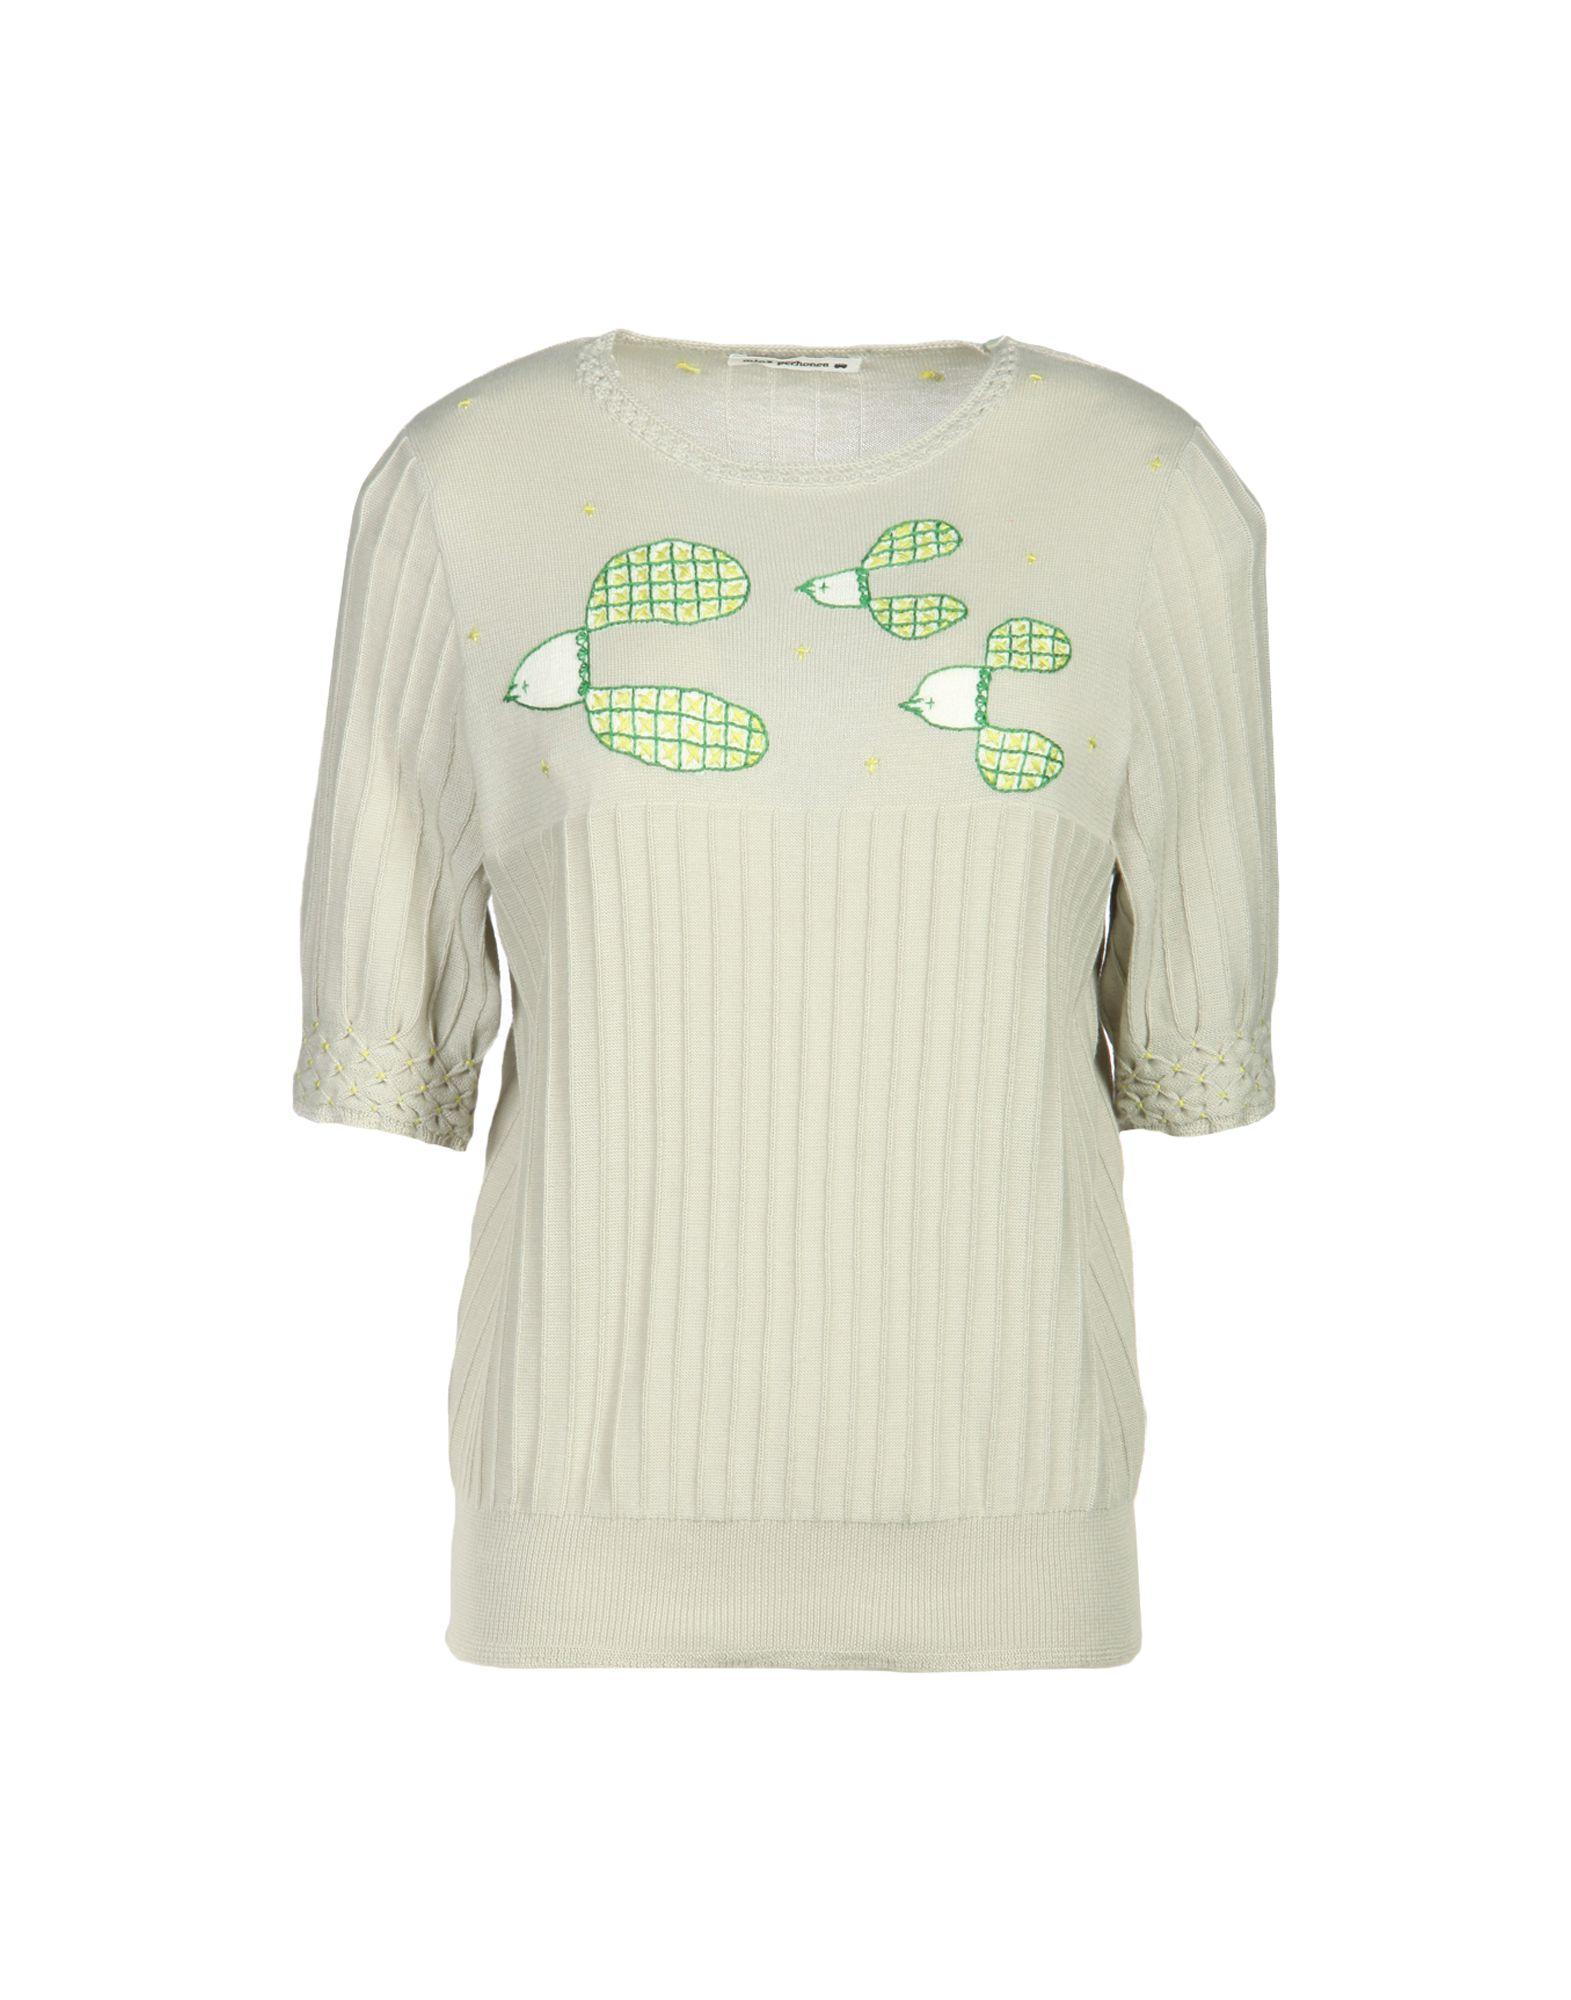 MINÄ PERHONEN Sweater in Light Grey